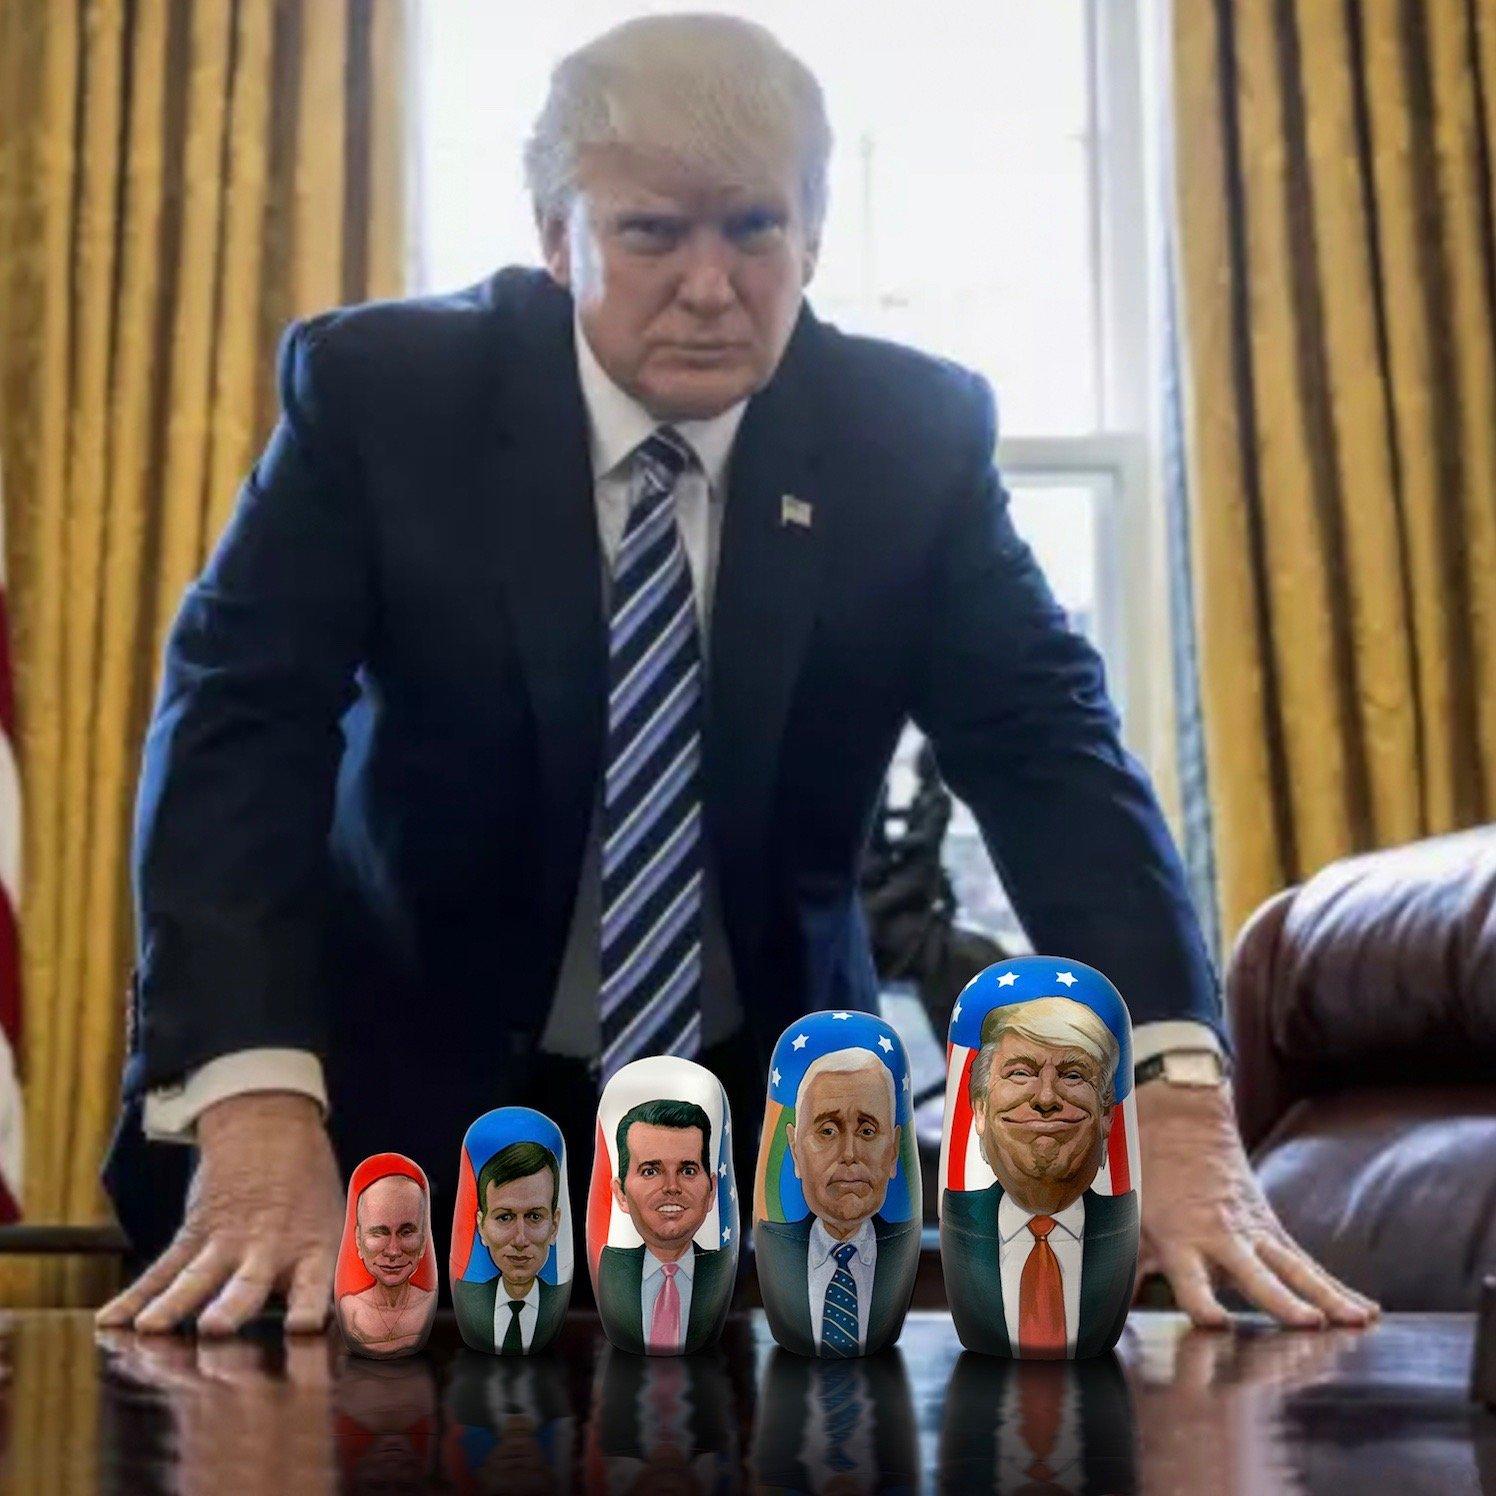 Concentric Surprise Trump & Putin Russian Matryoshka Nesting Doll - Kickstarter Famous! 6'' Tall - 5 Piece Set by Concentric Surprise